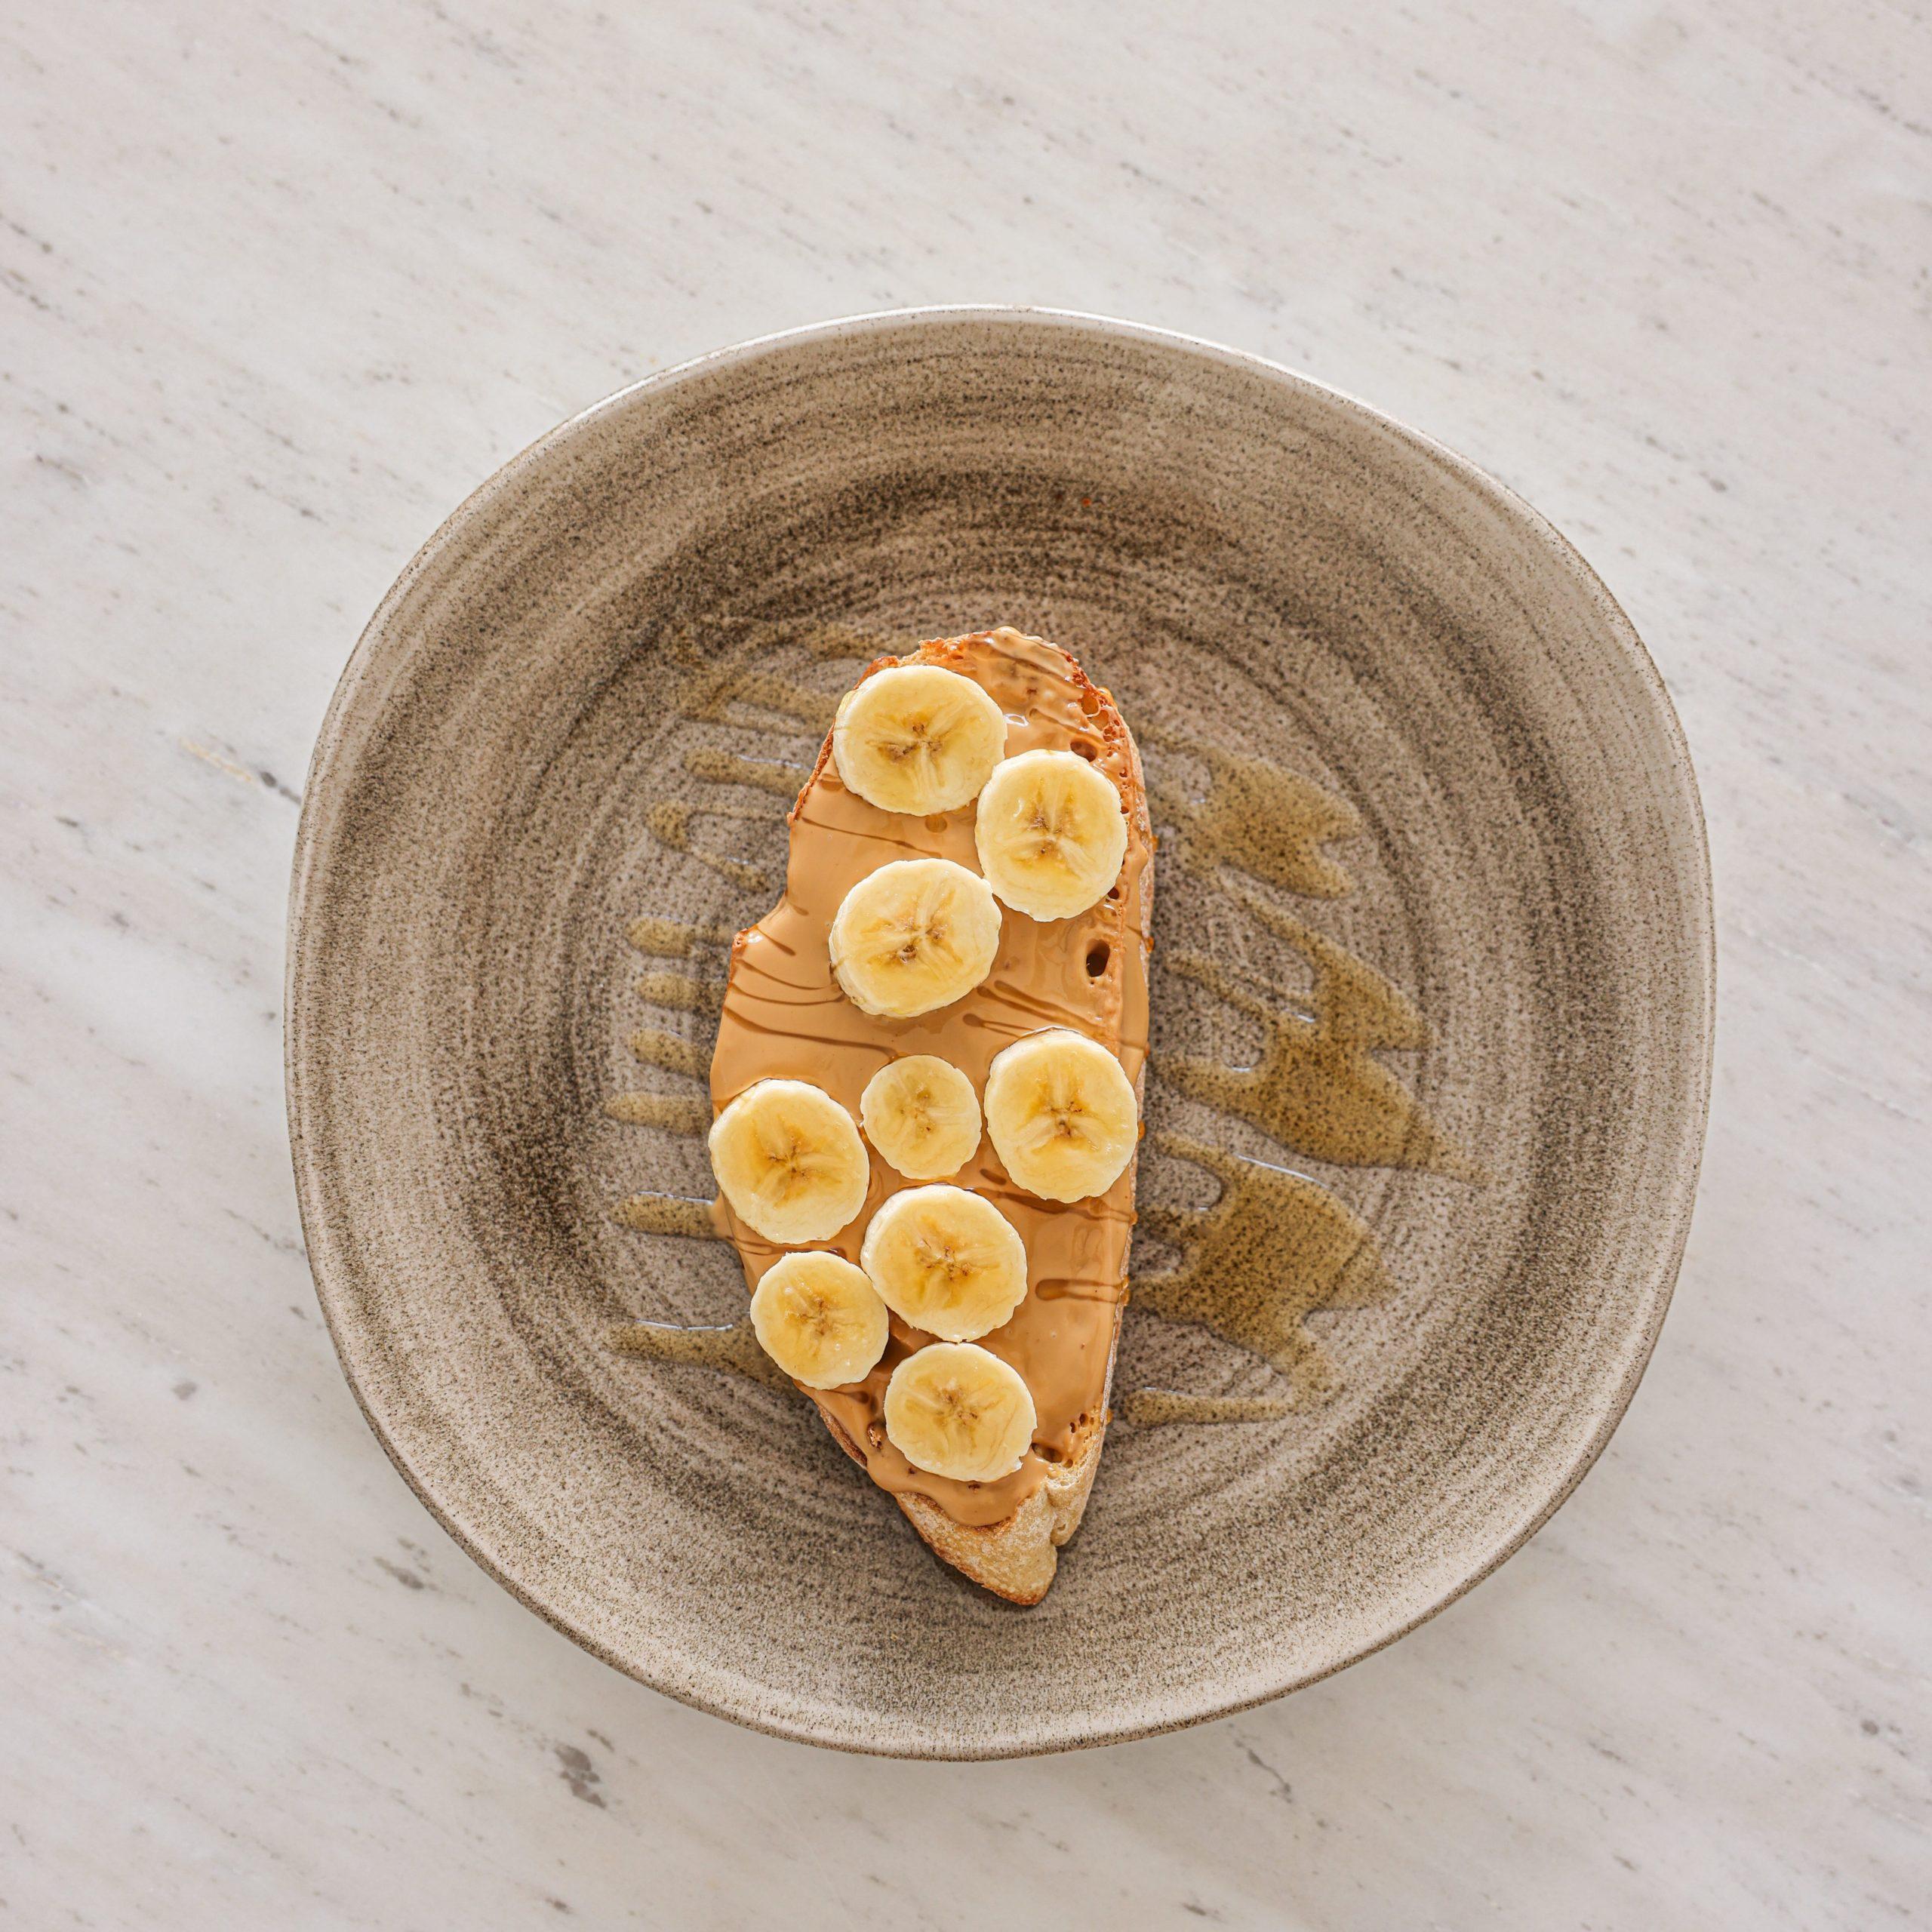 Desayuno vegano tostadas con peanut butter